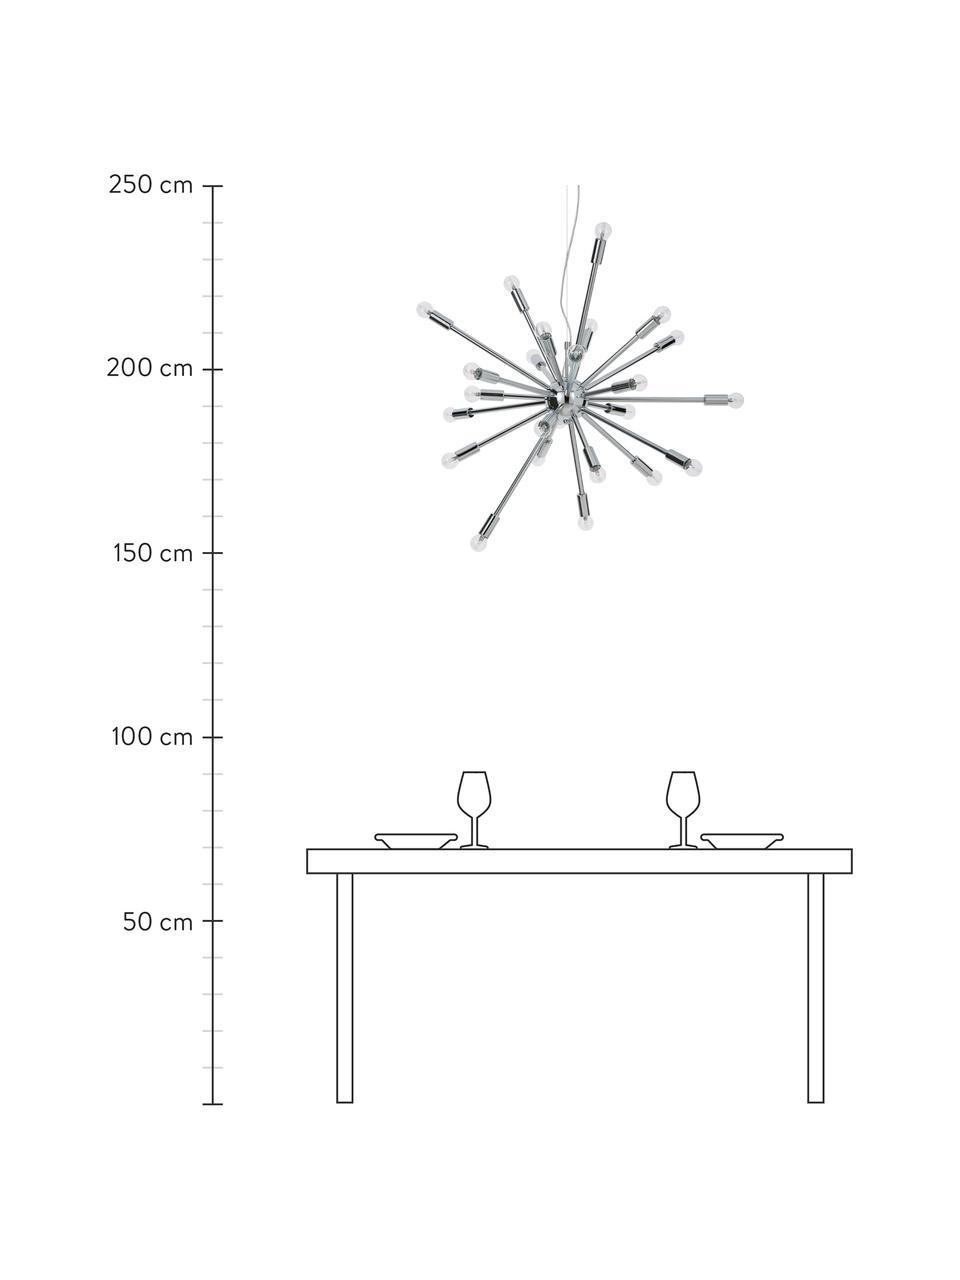 Grote hanglamp Spike in chroom, Baldakijn: verchroomd metaal, Lampenkap: verchroomd metaal, Baldakijn: chroomkleurig. Lampenkap: chroomkleurig. Snoer: transparant, Ø 90 cm